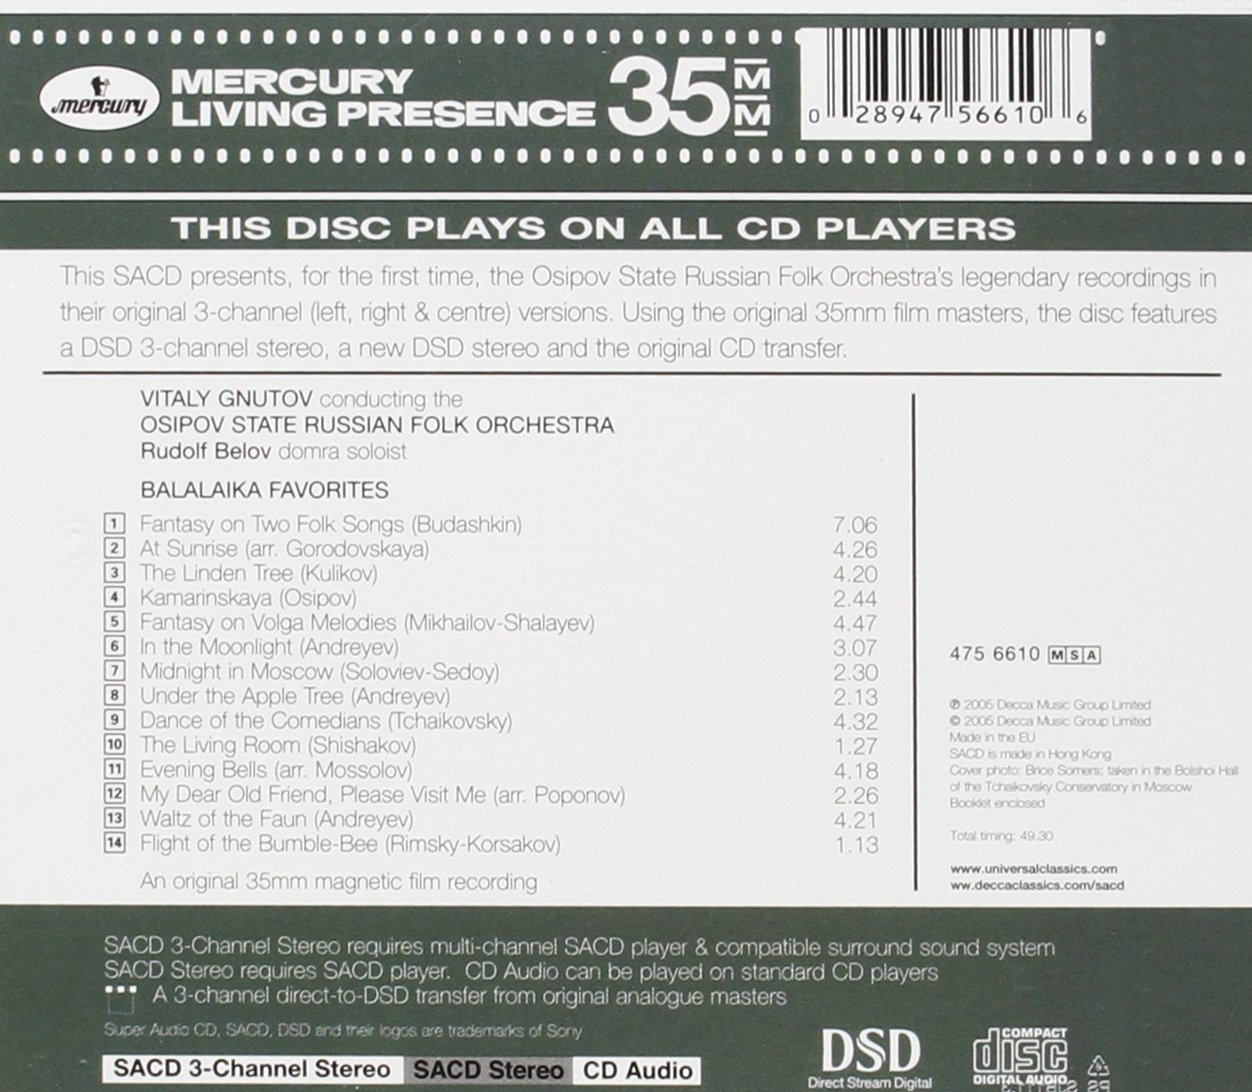 Balalaika Favorites (3-Channel and Stereo Hybrid SACD) by Mercury Living Presence